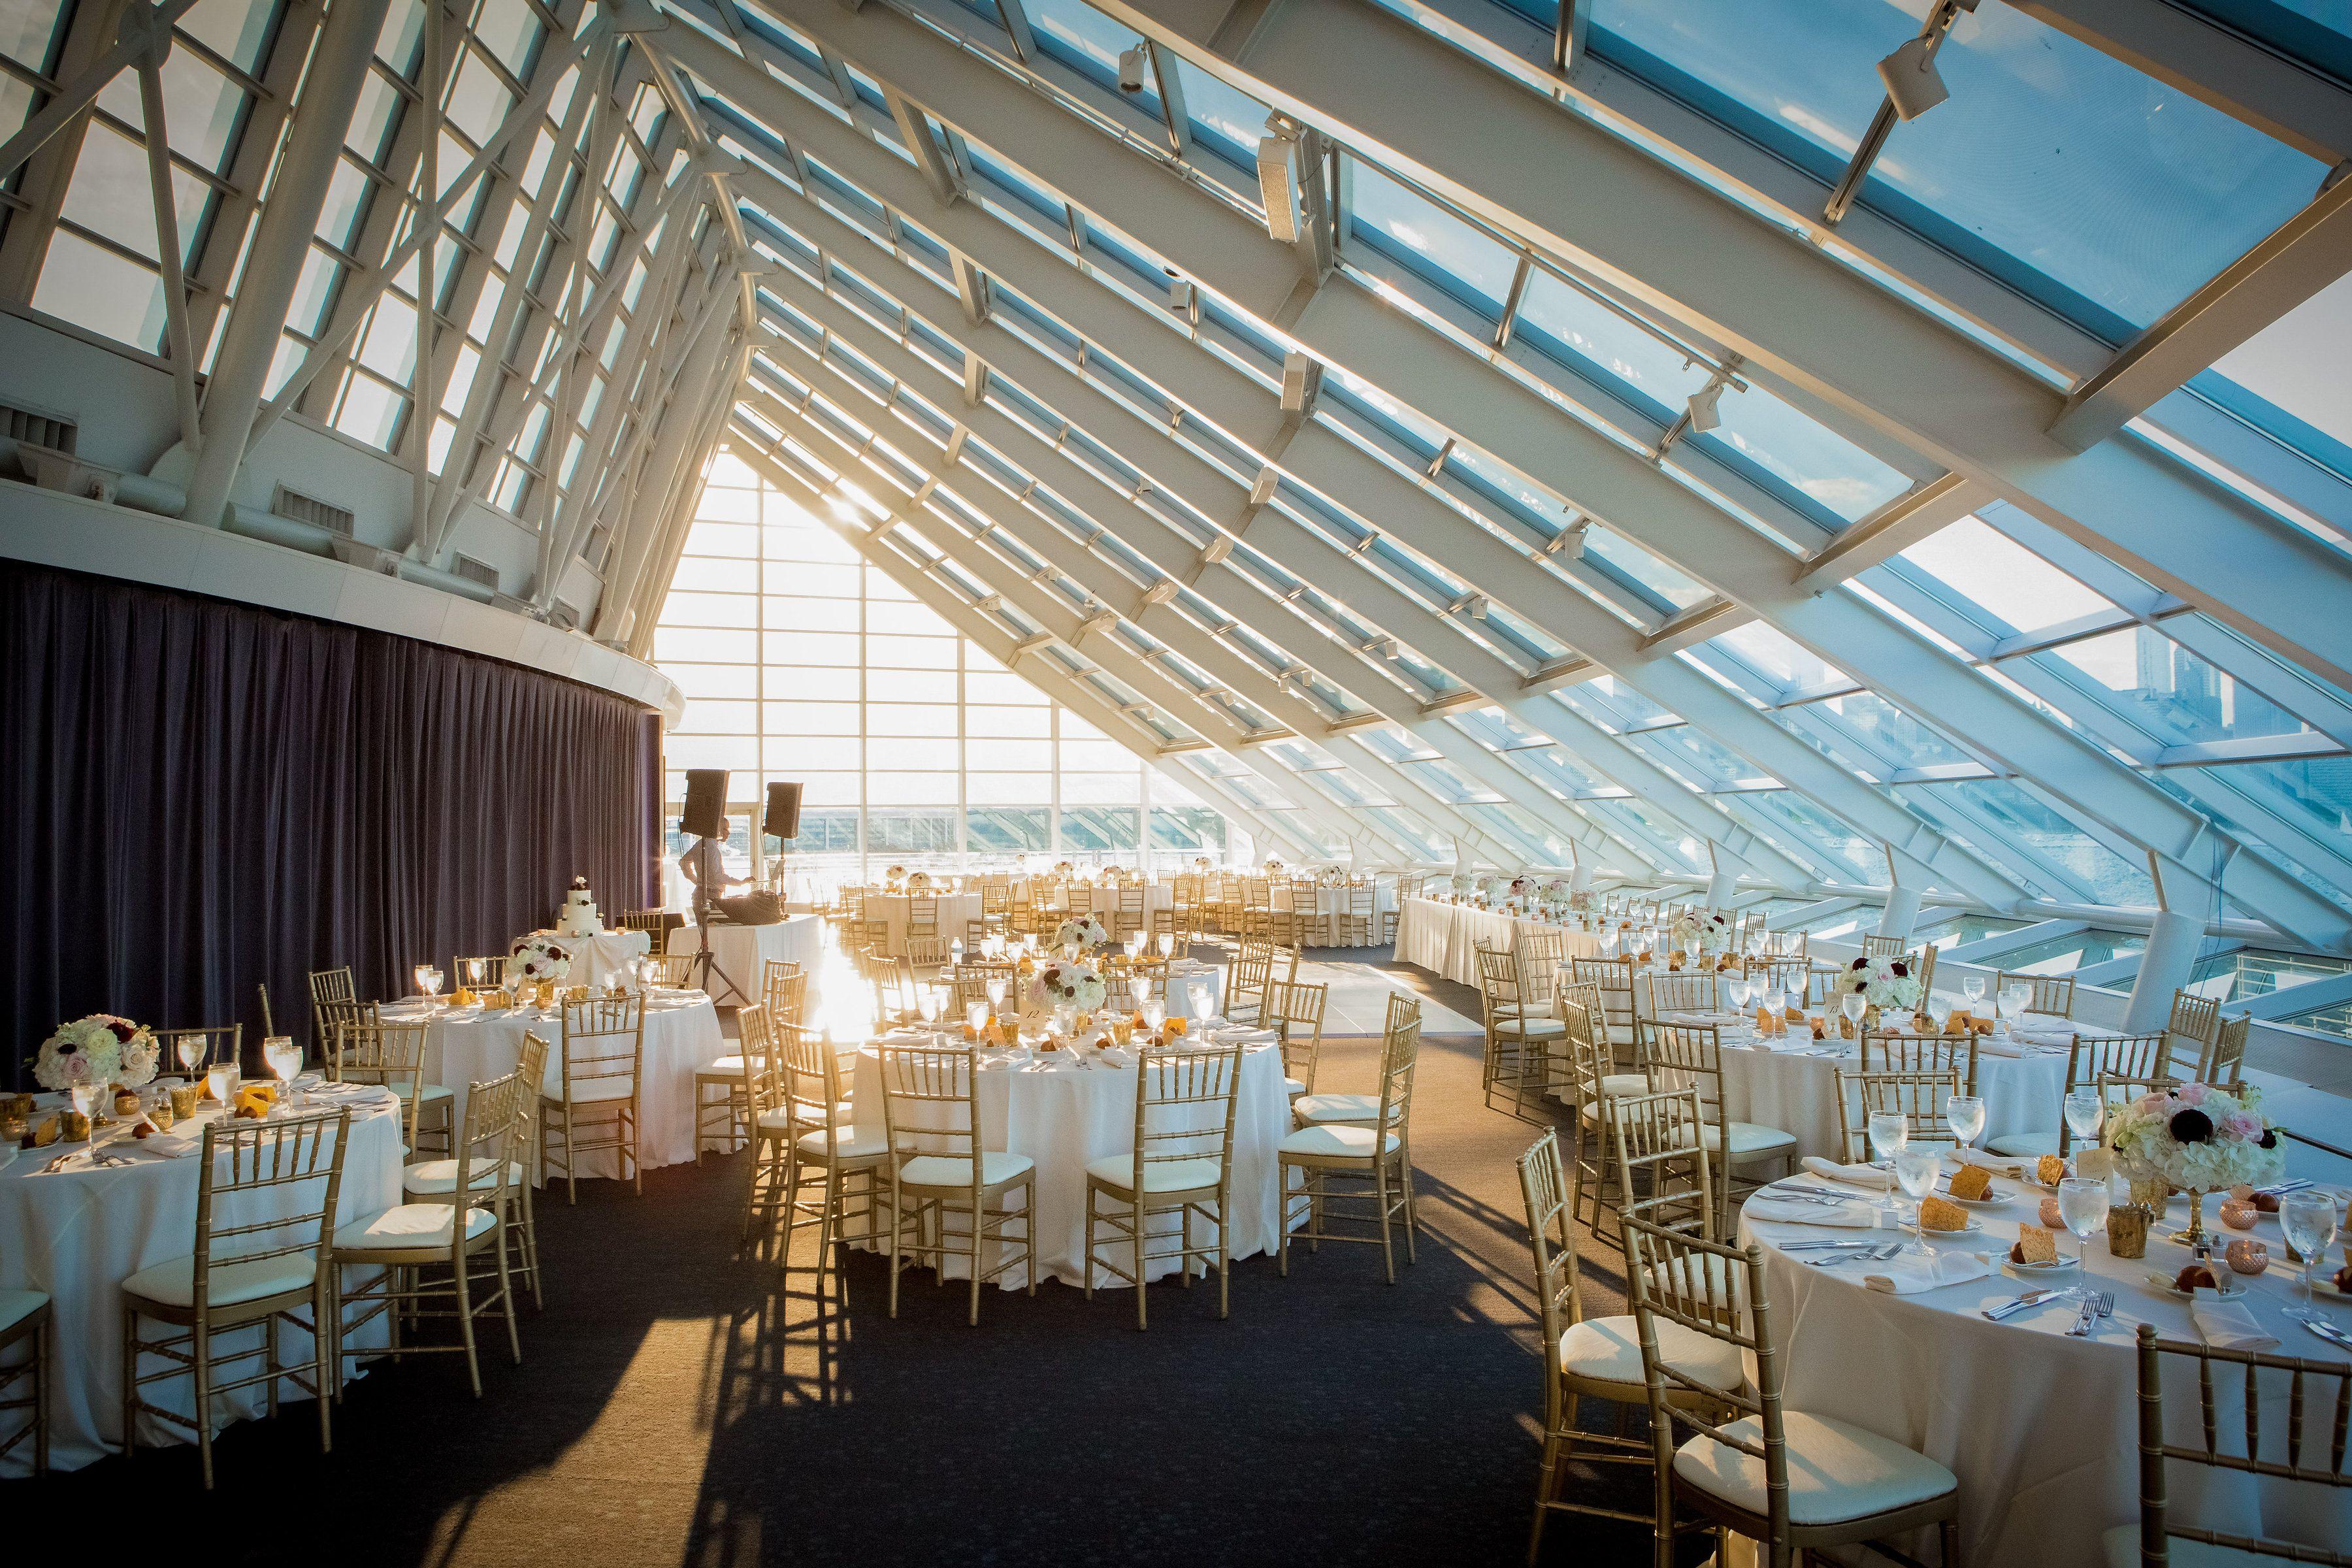 Adler Planetarium Wedding.Adler Planetarium Wedding Chicago Il Adler Planetarium Wedding